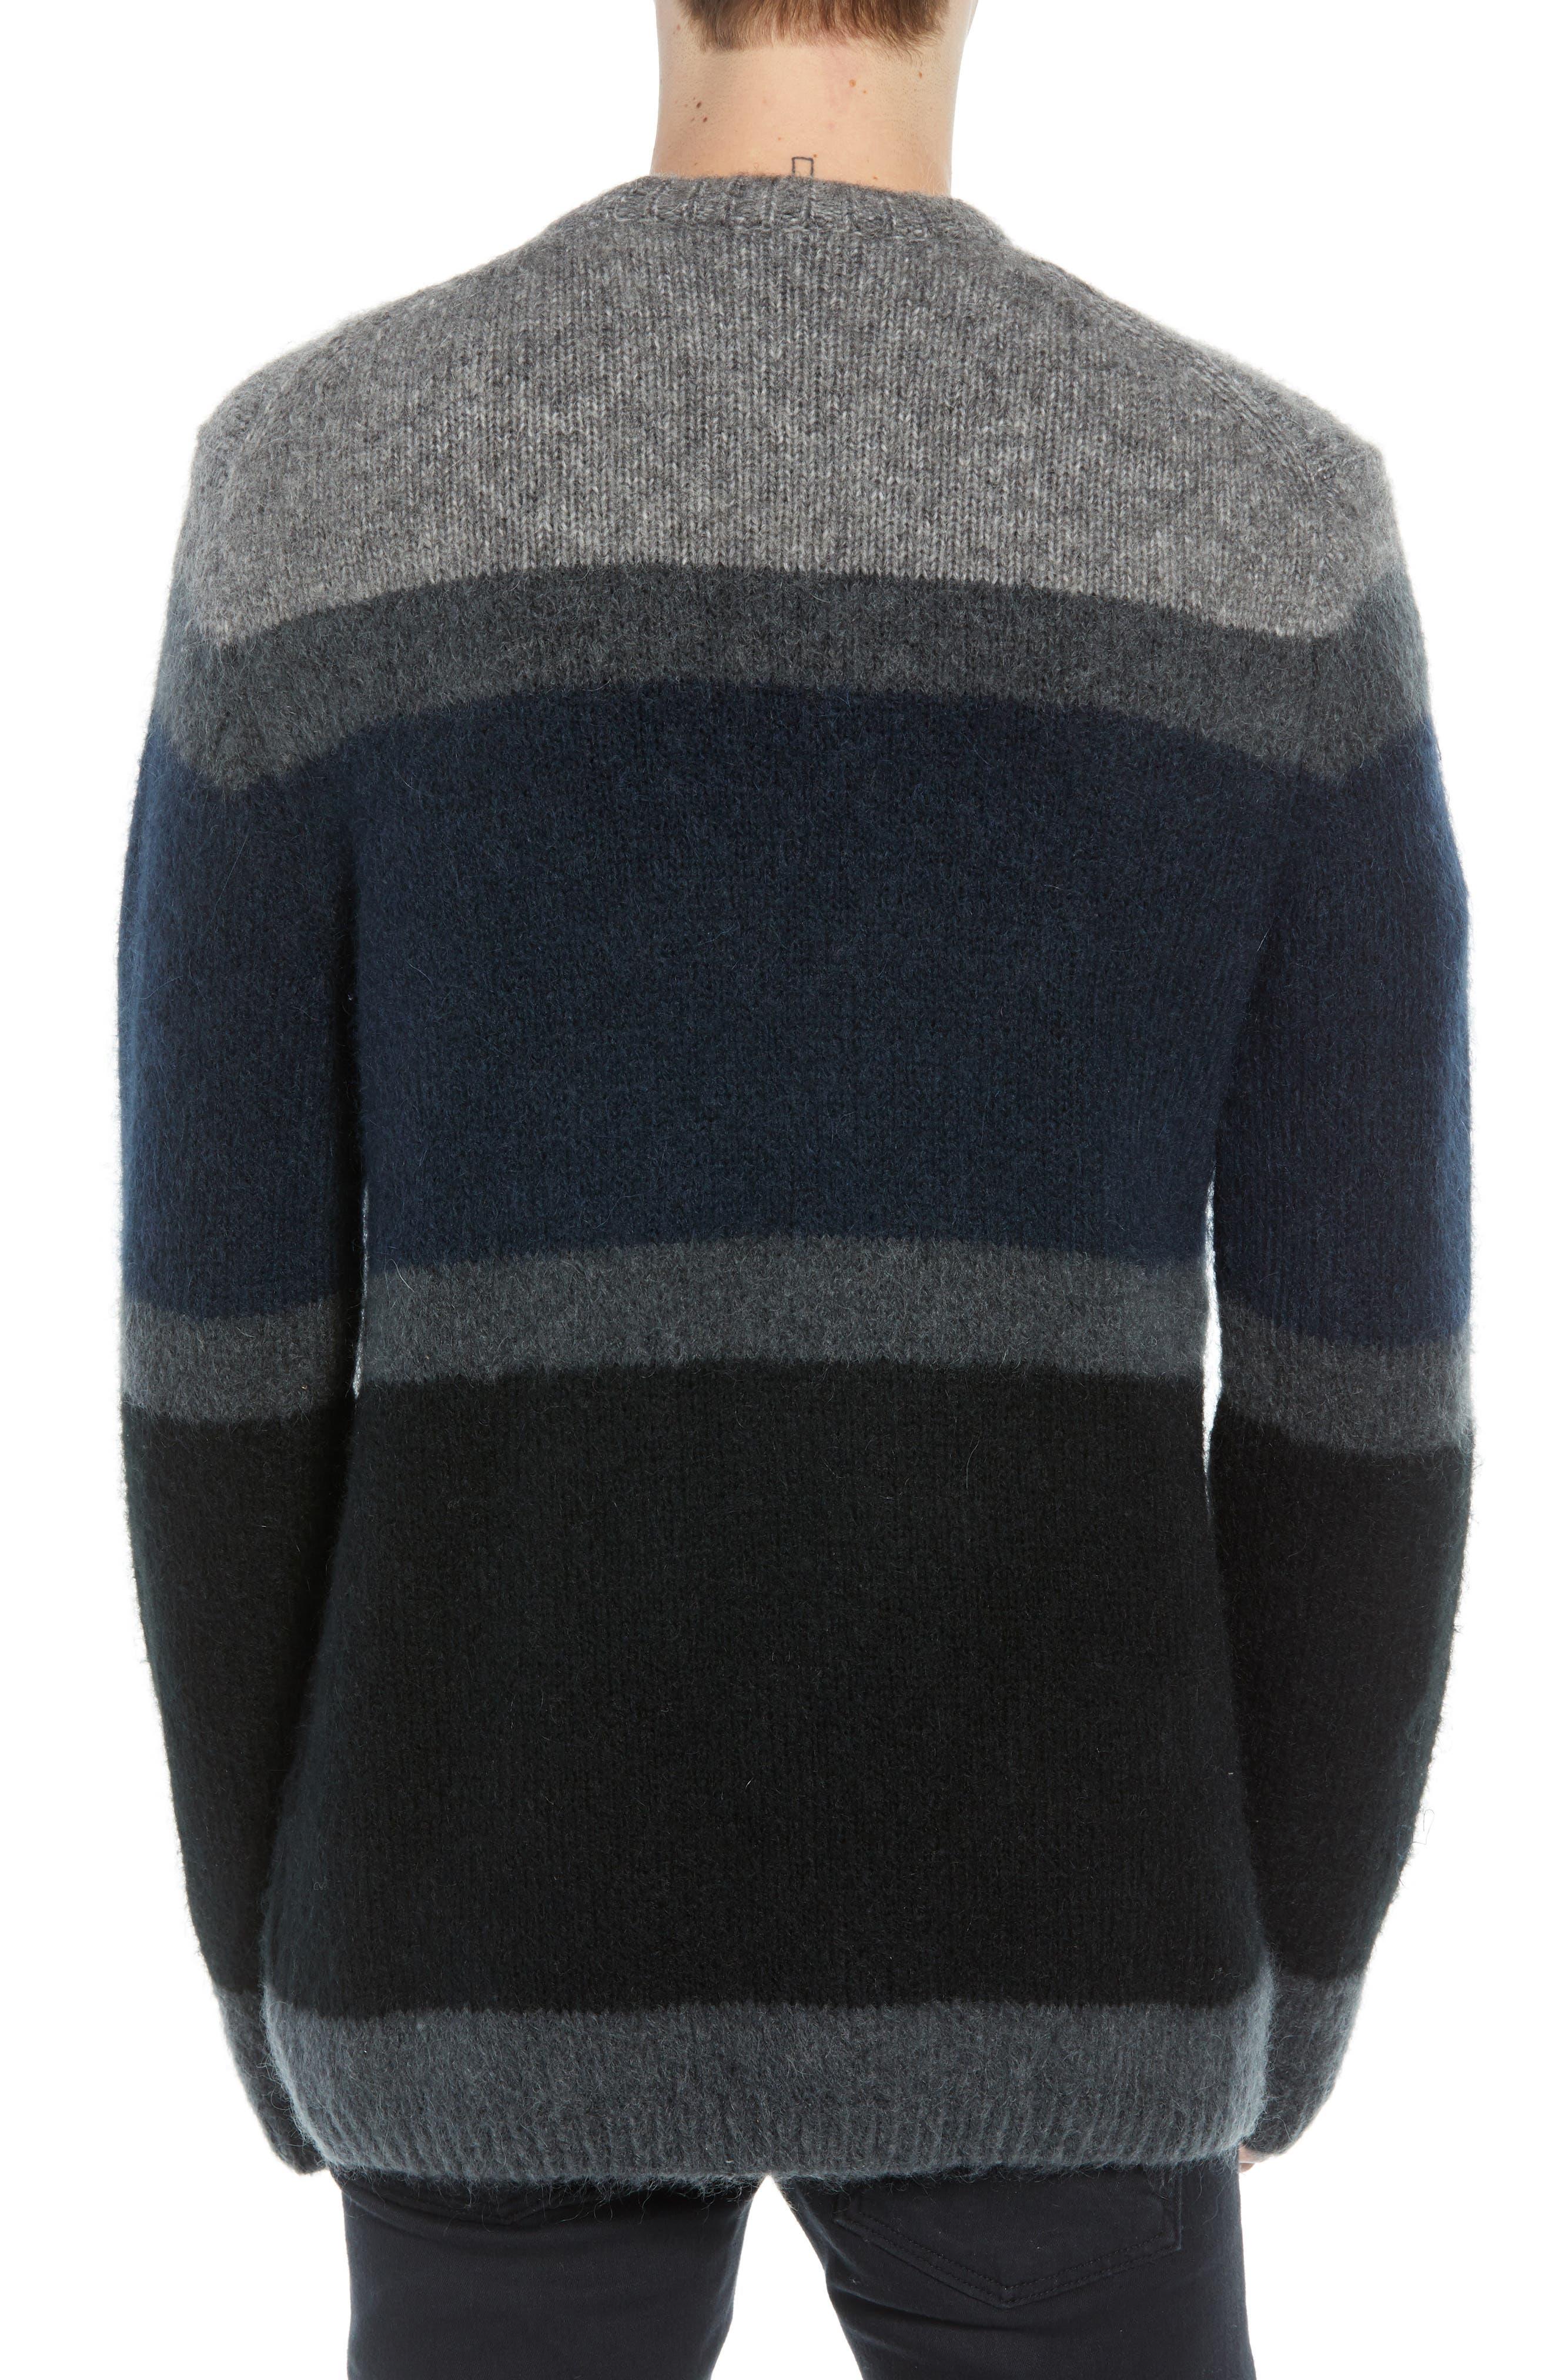 Stripe Sweater,                             Alternate thumbnail 2, color,                             UTILITY BLUE CHARCOAL MELANGE